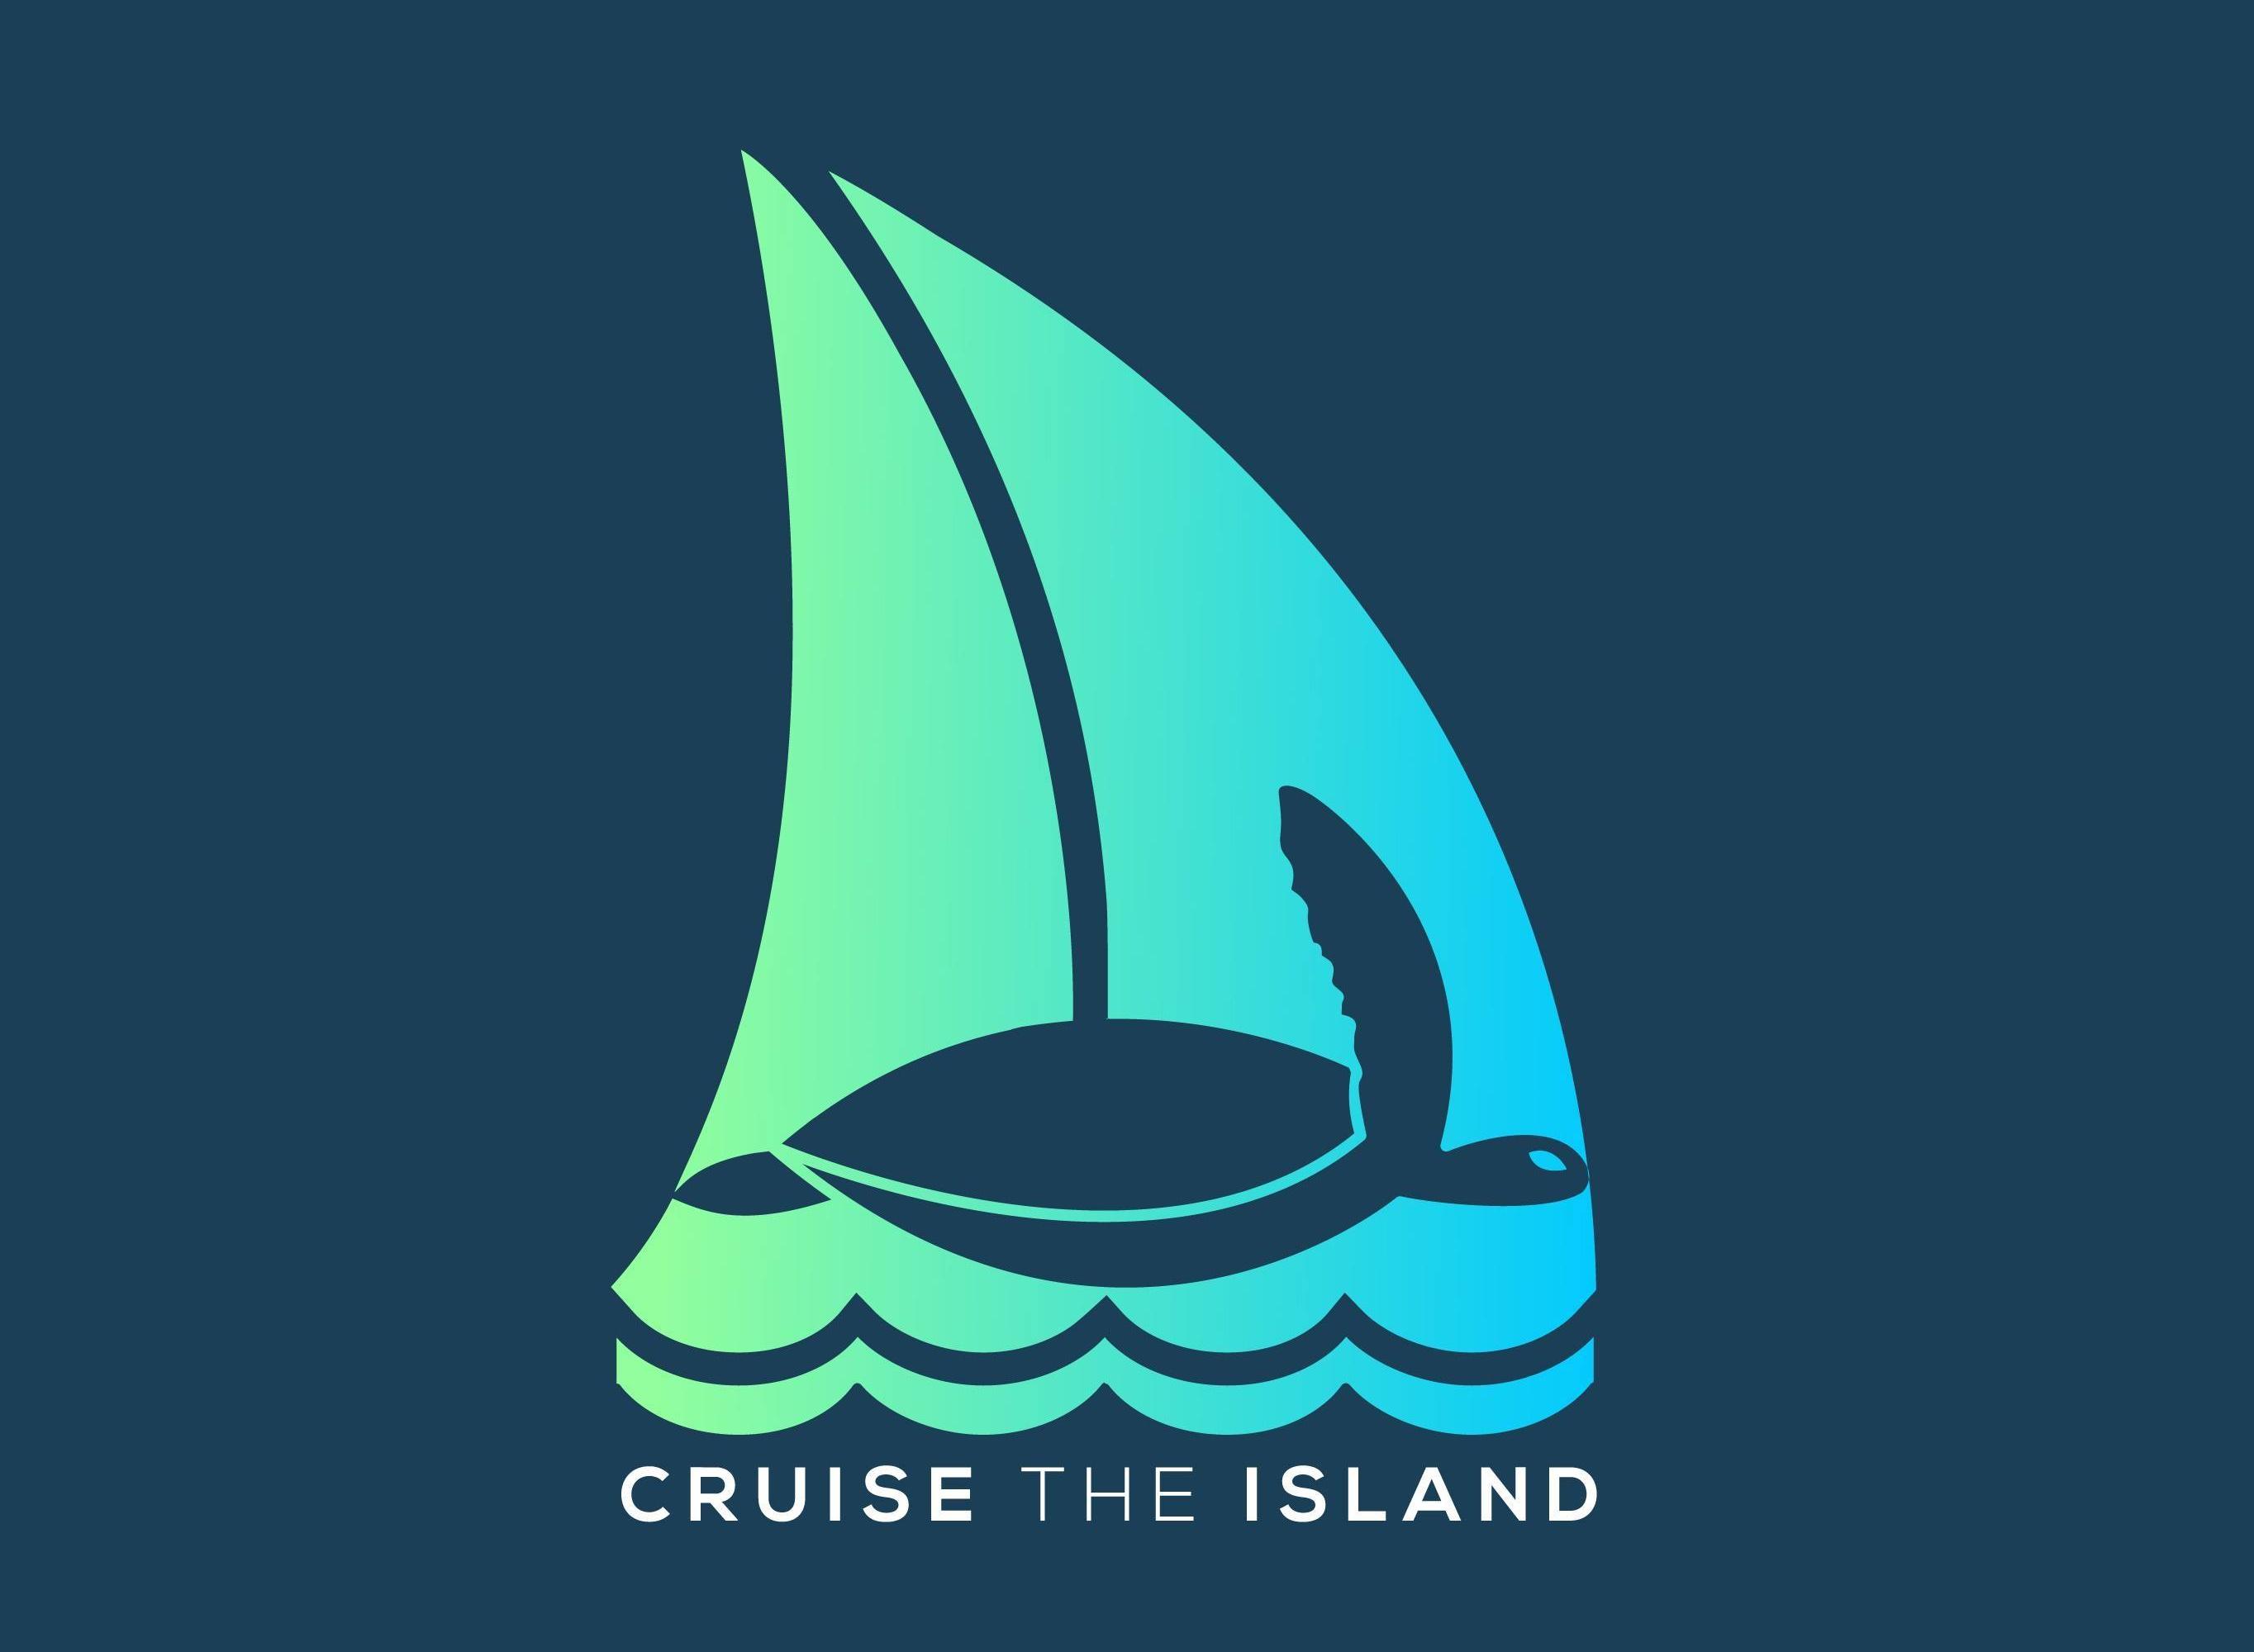 Cruise the Island